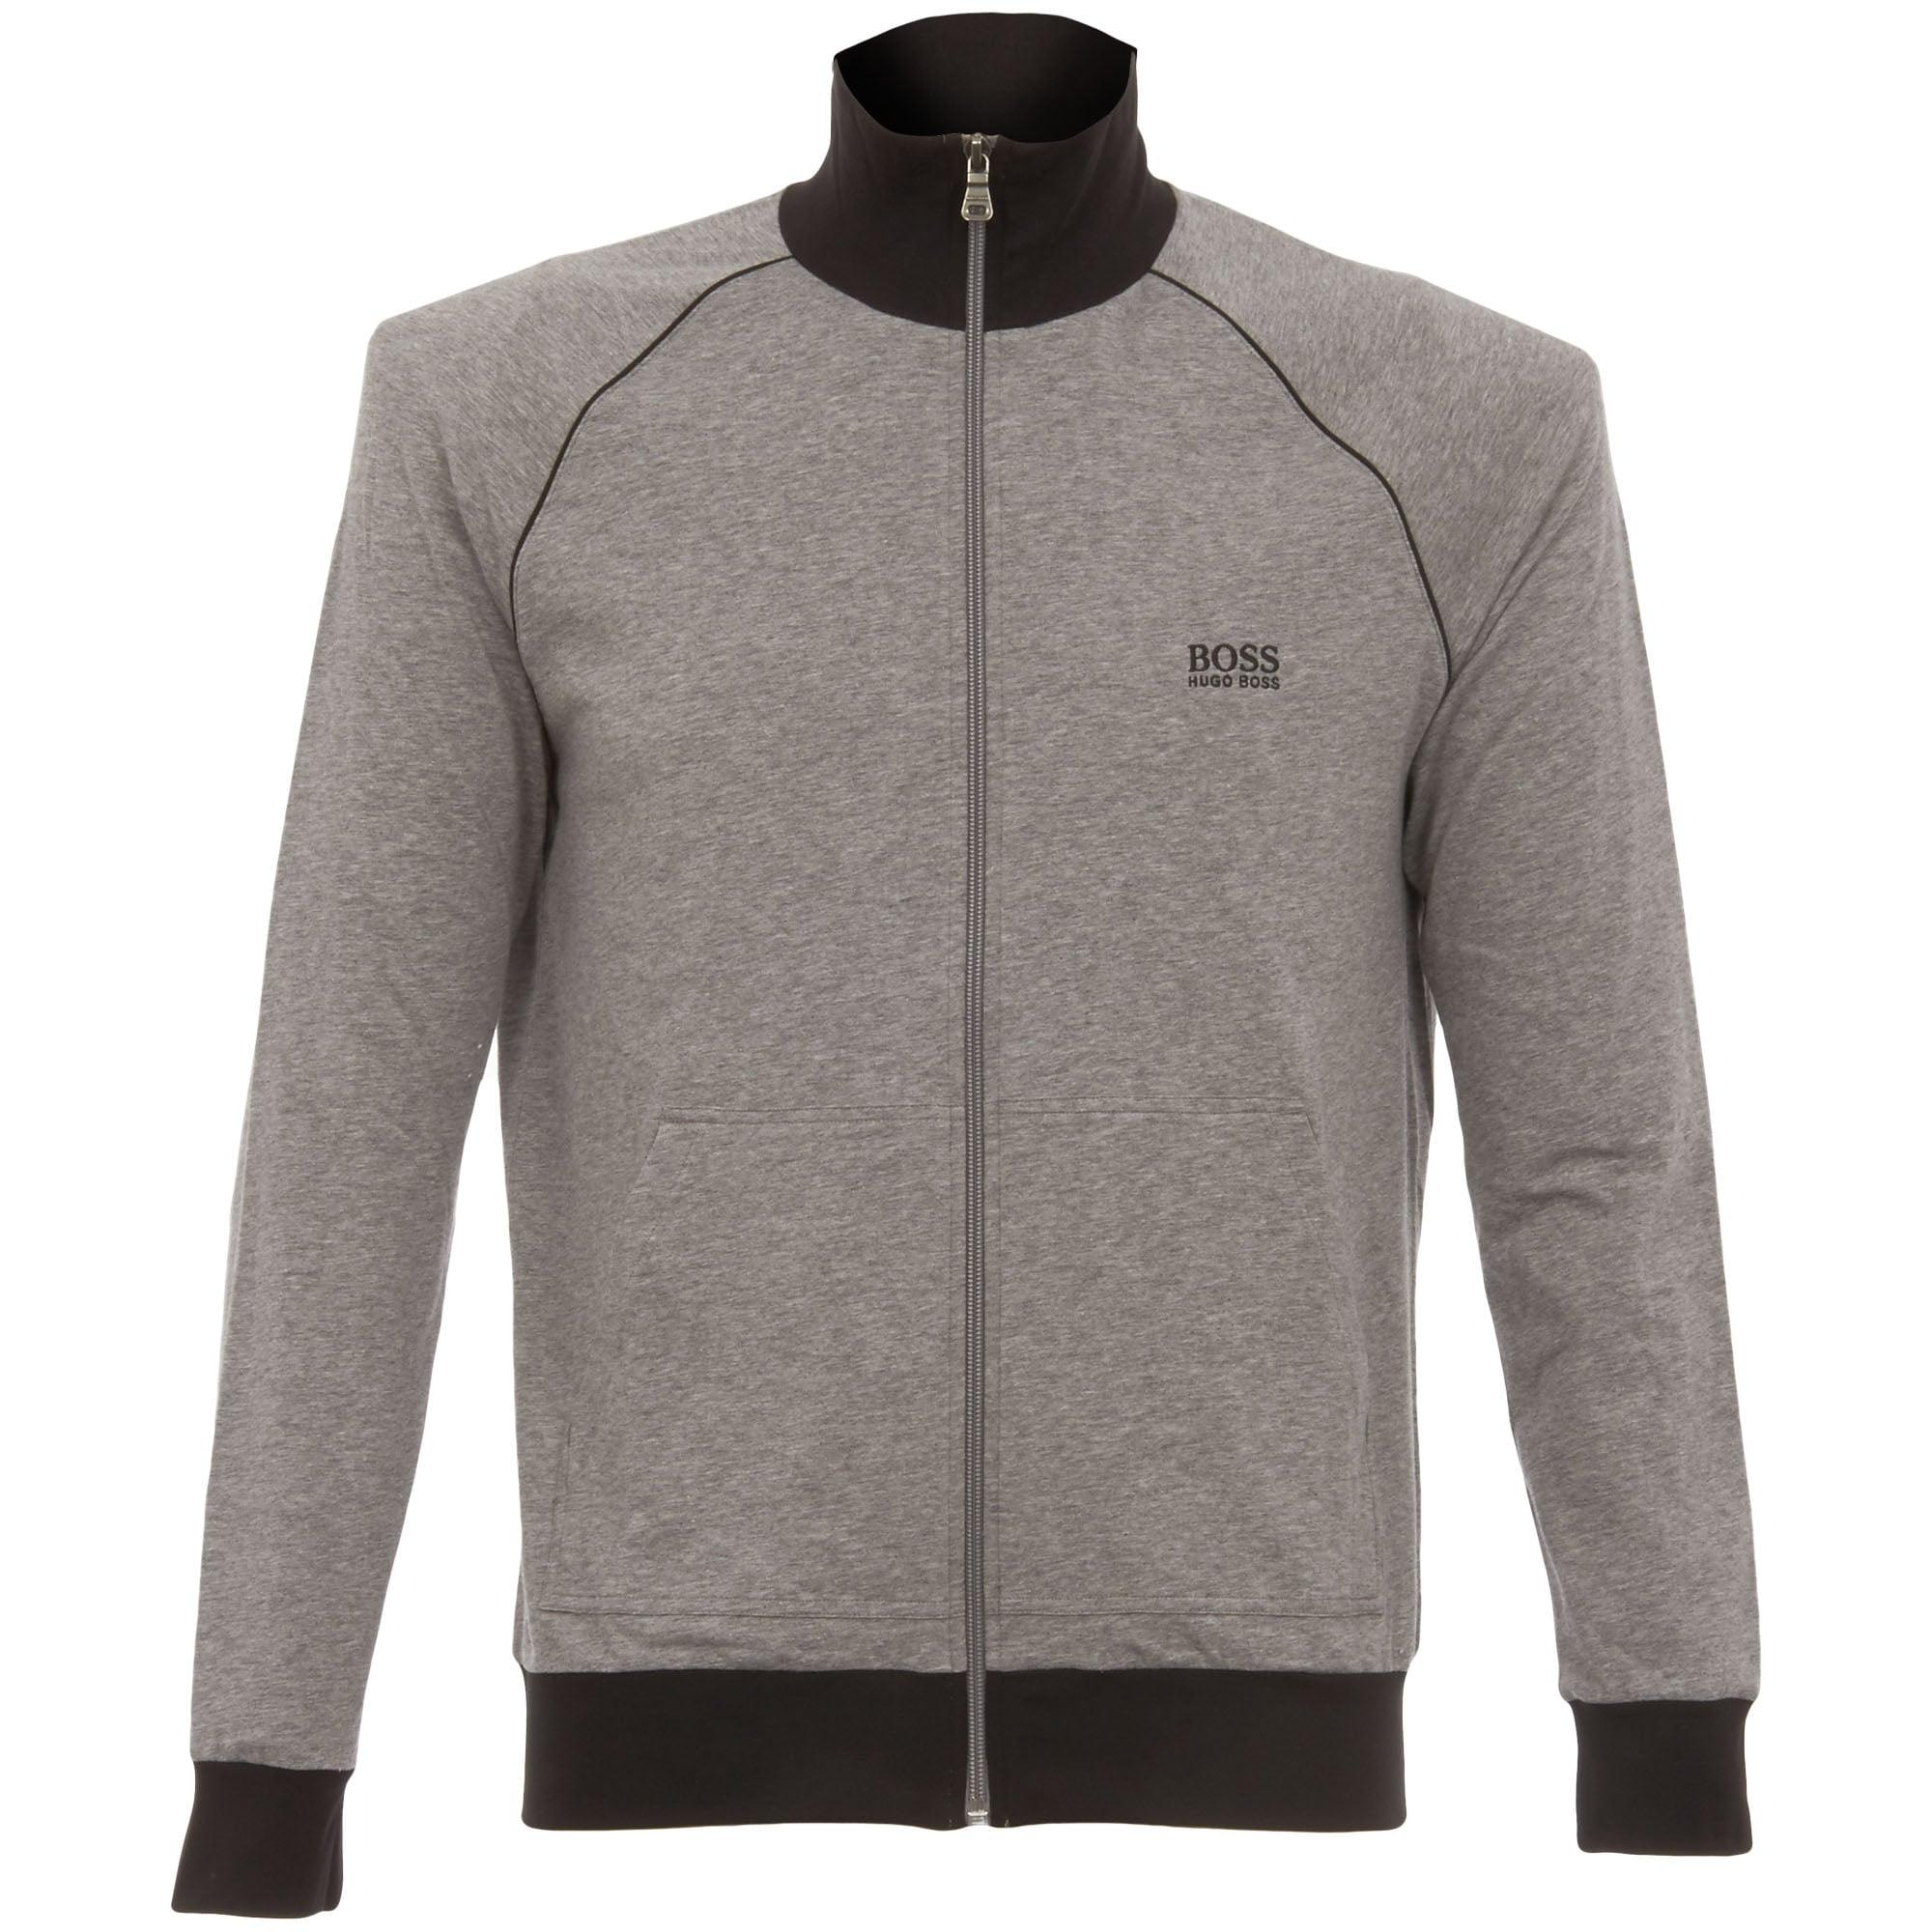 629406521 Hugo Boss Zip Track Top Grey 5031044MG | Stuarts London